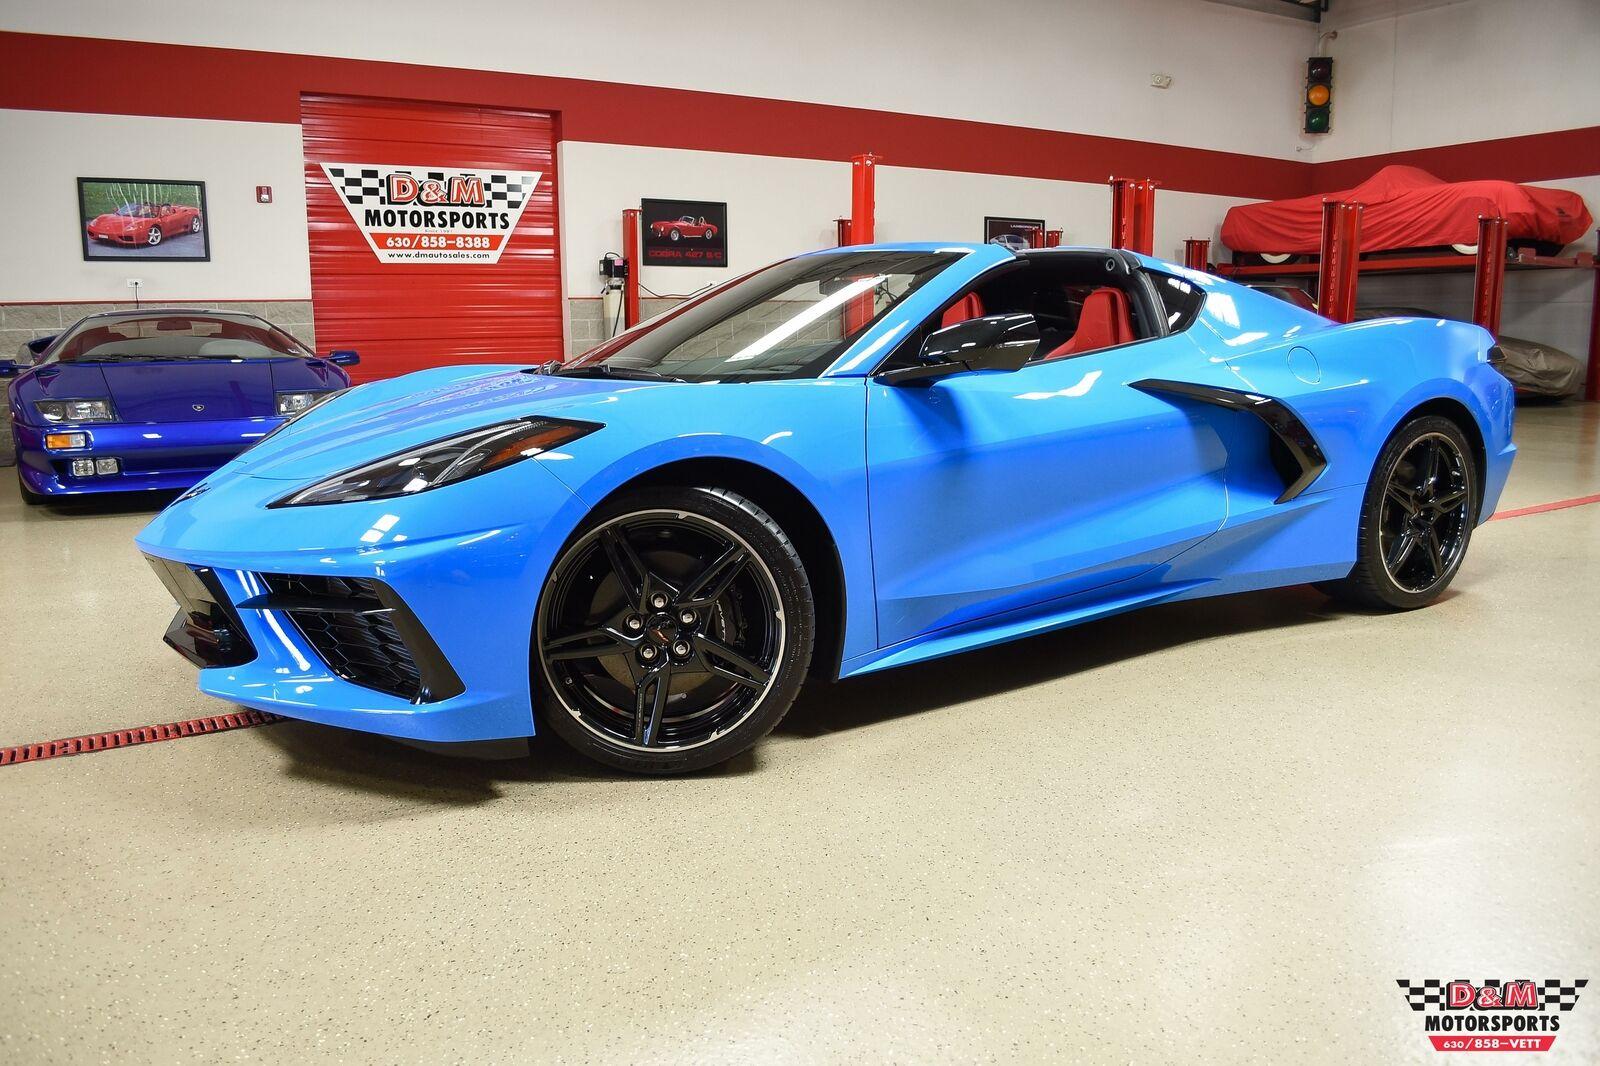 2020 Blue Chevrolet Corvette Stingray  | C7 Corvette Photo 1